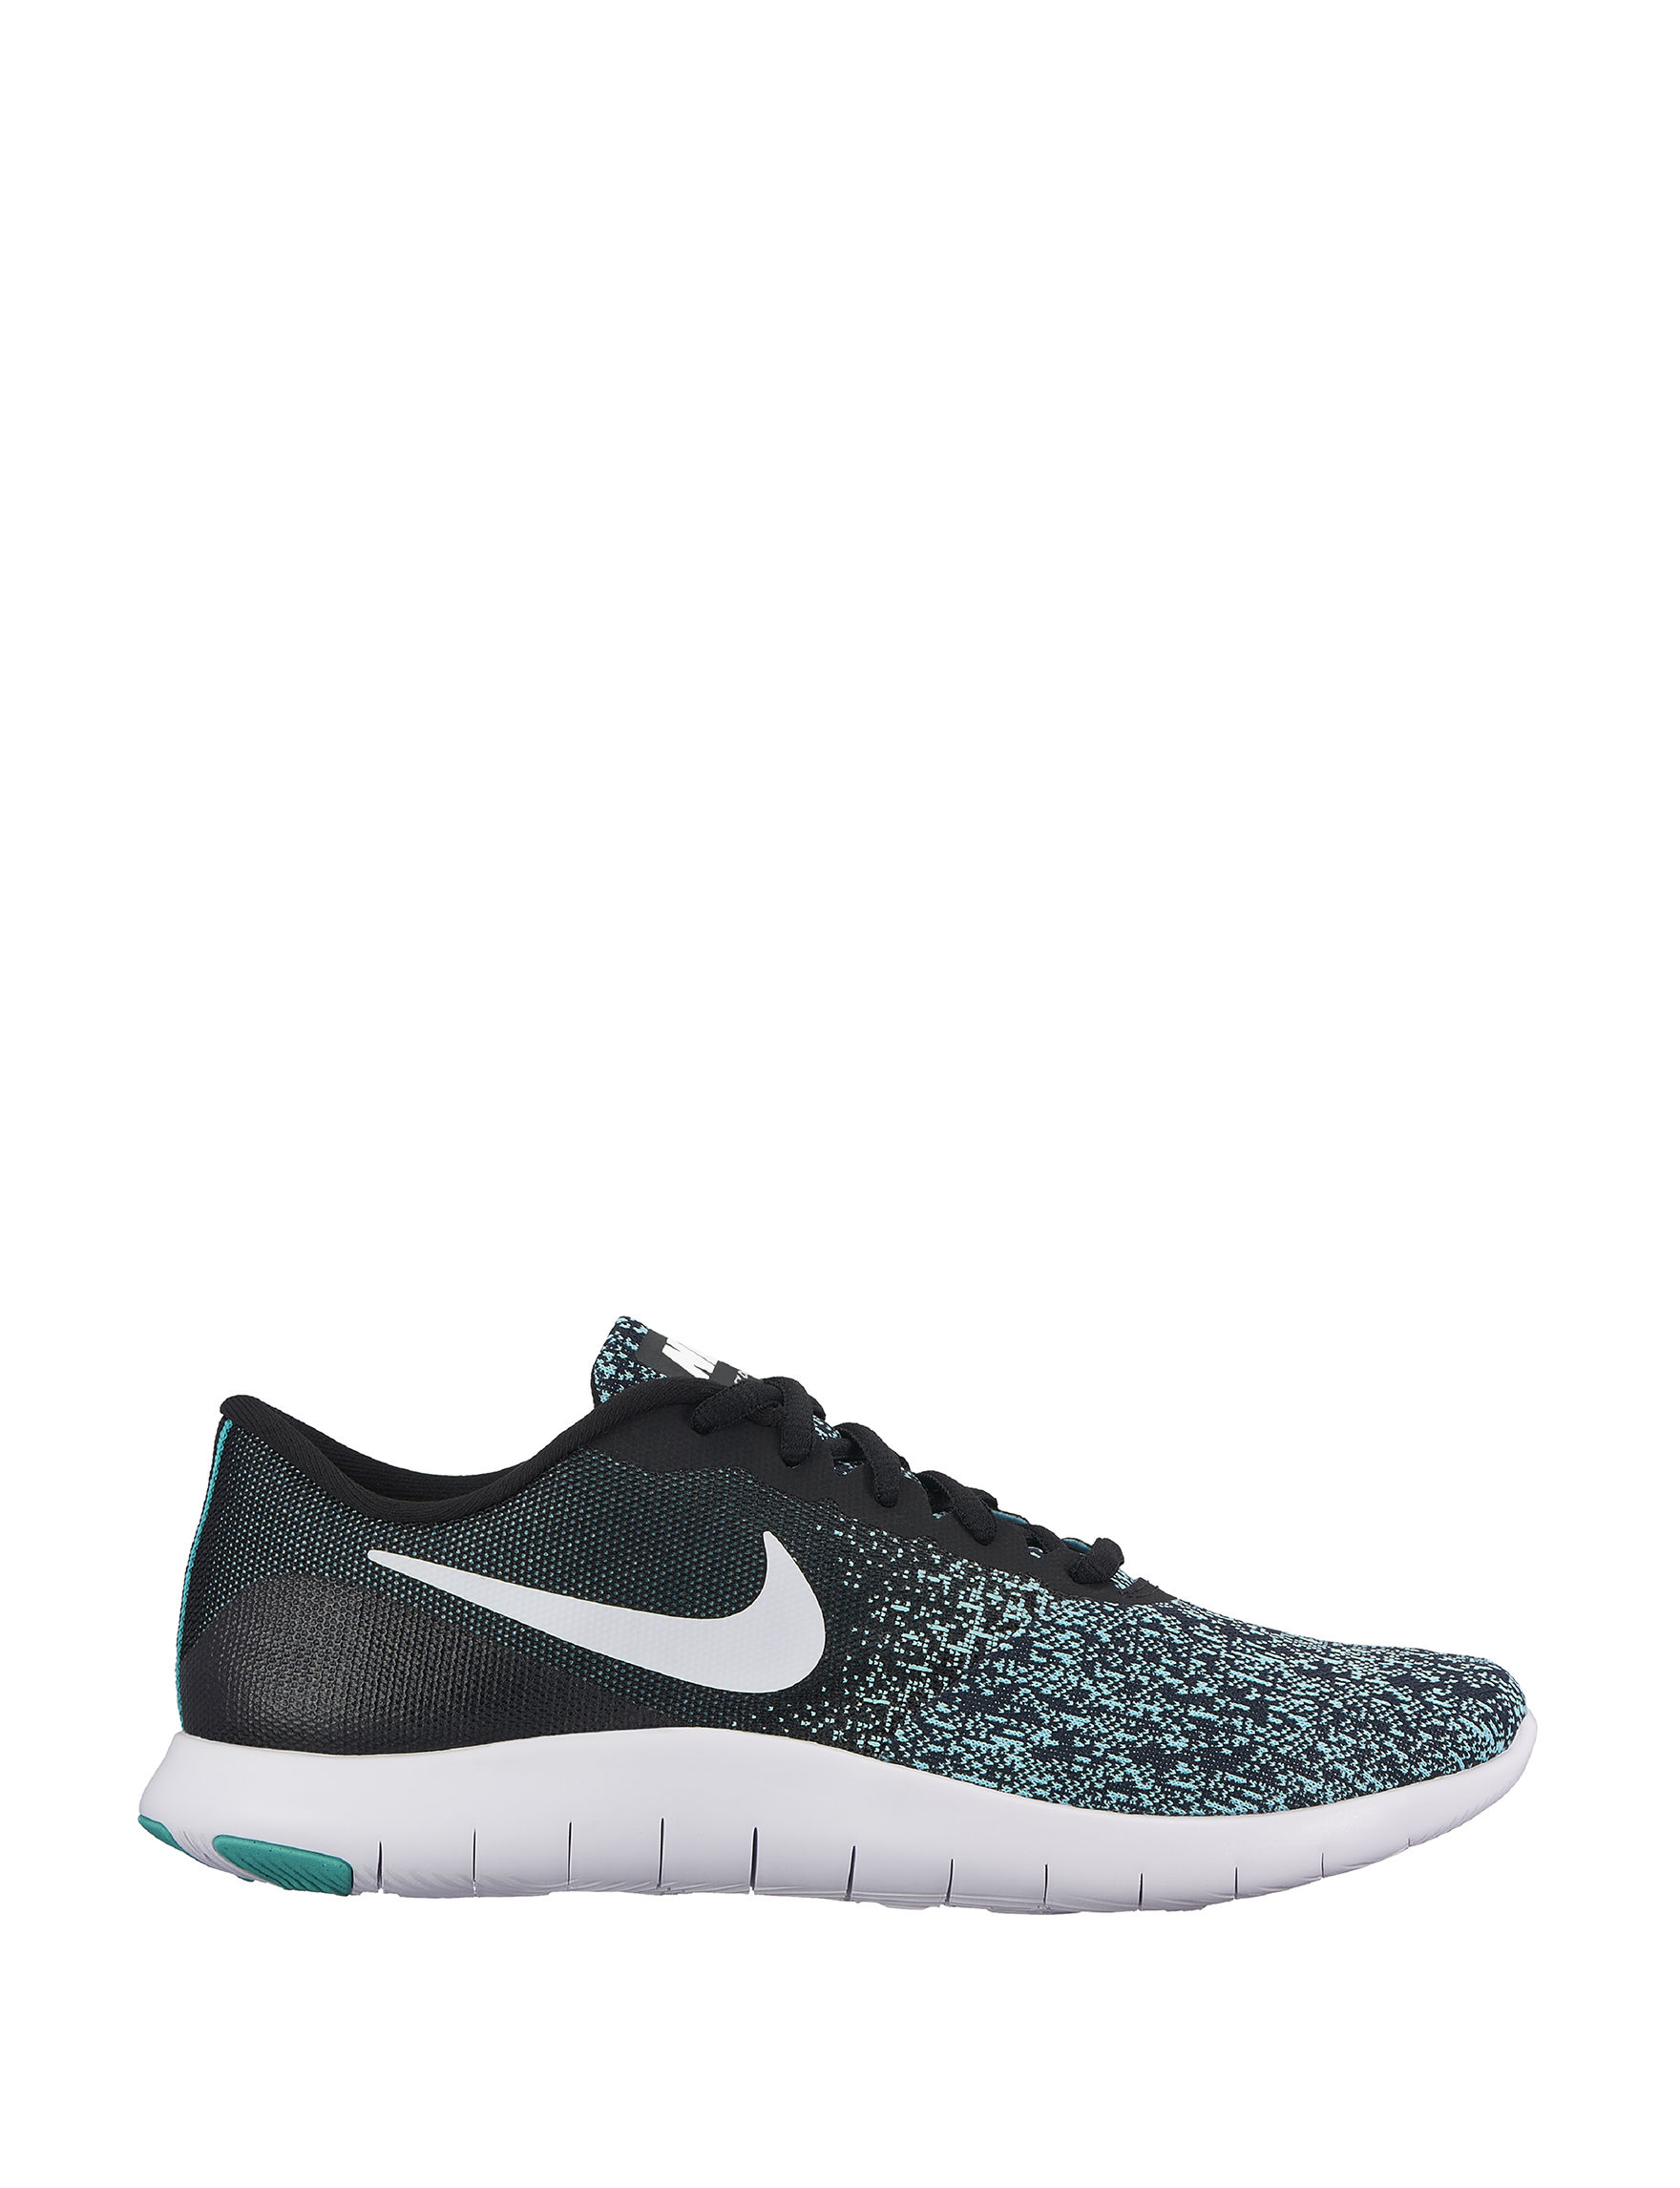 Nike Black / Aqua